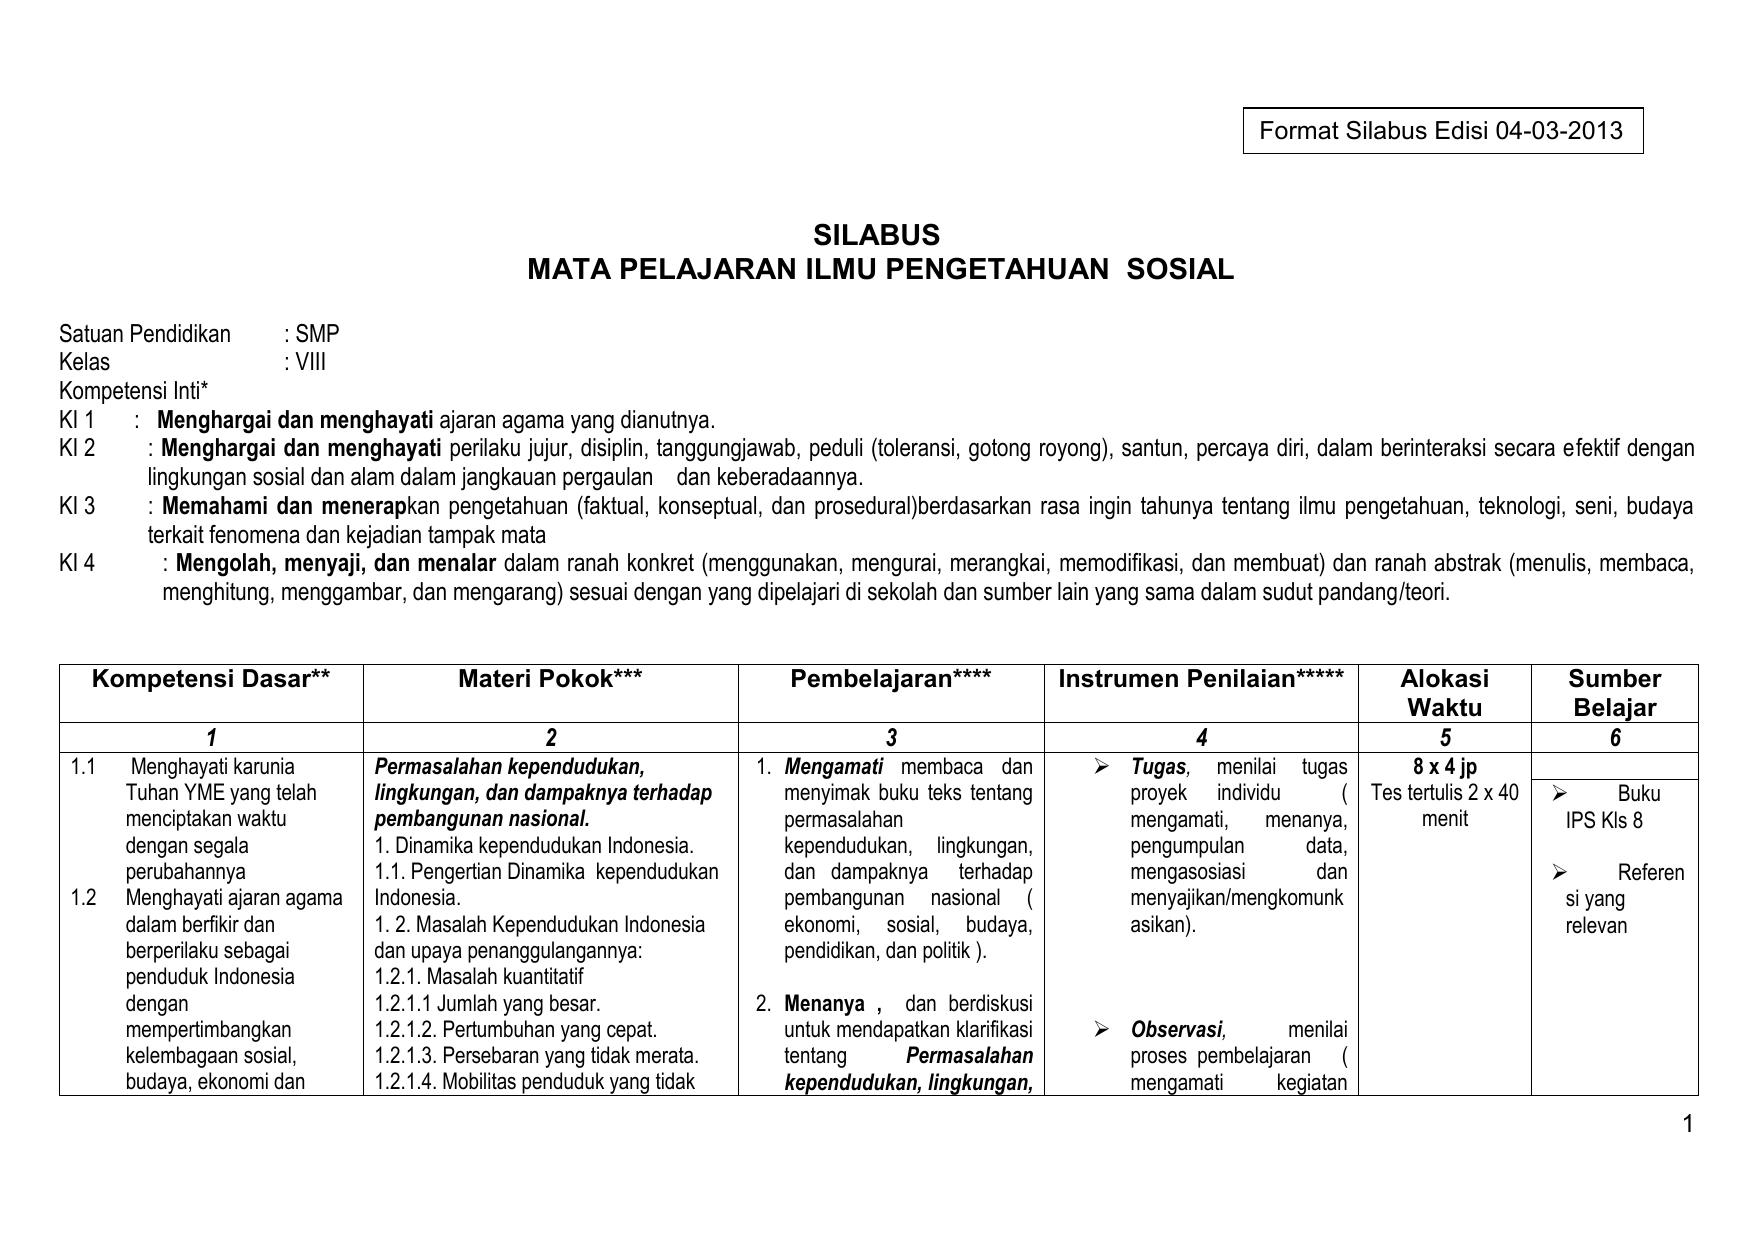 Contoh Silabus Ips Sd Guru Ilmu Sosial